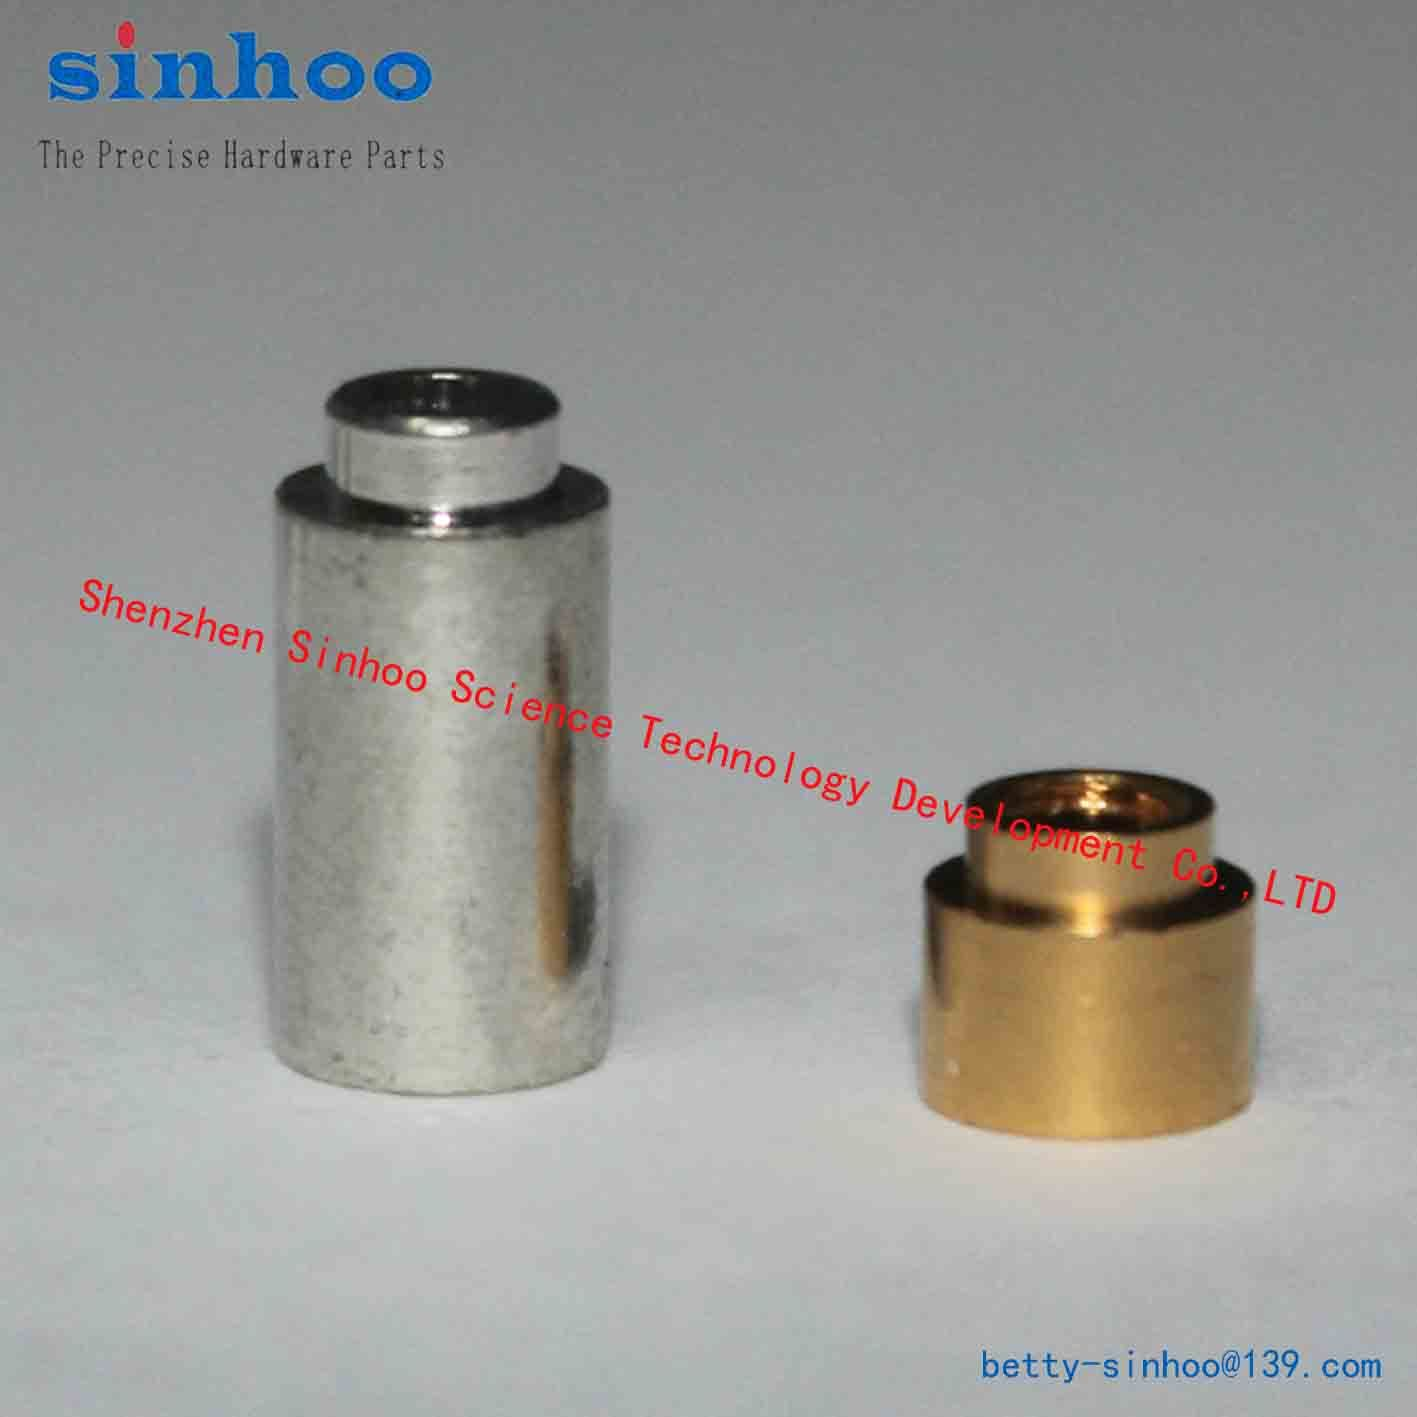 Smtso-M2.5-10et, SMD Nut, Weld Nut, Reelfast/Surface Mount Fasteners/SMT Standoff/SMT Nut, Brass Reel